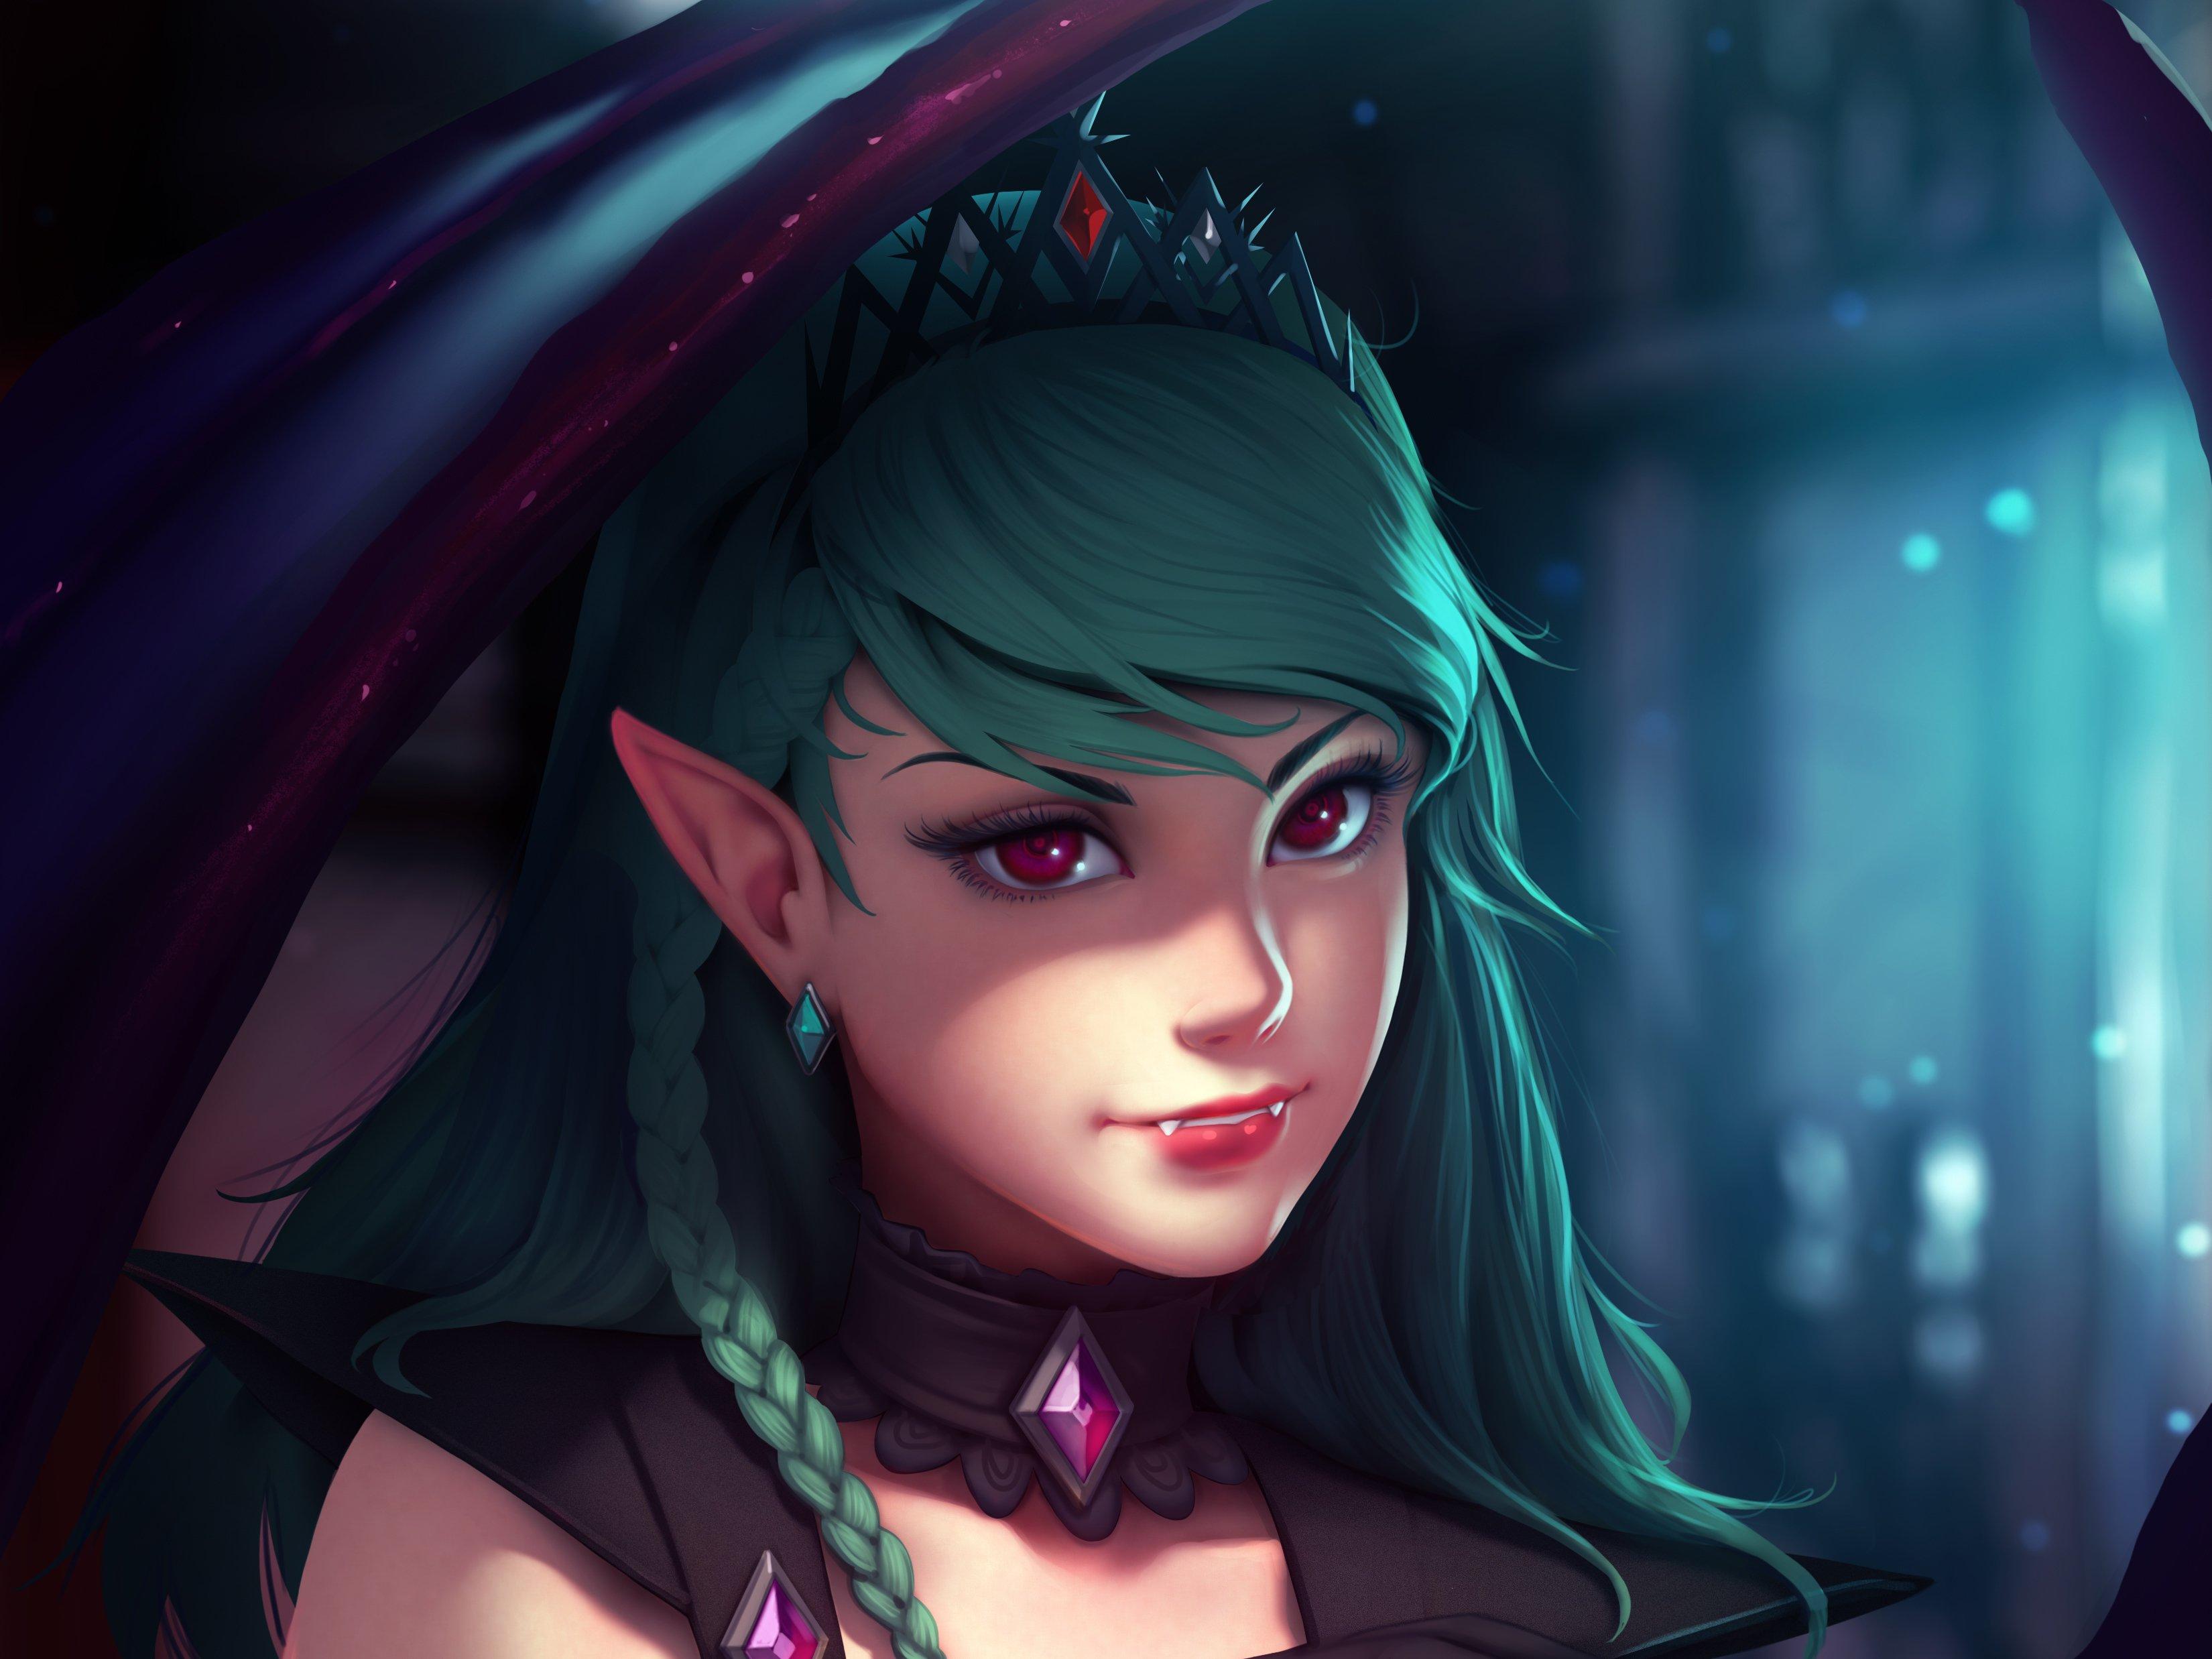 Fantasy women evil - photo#3